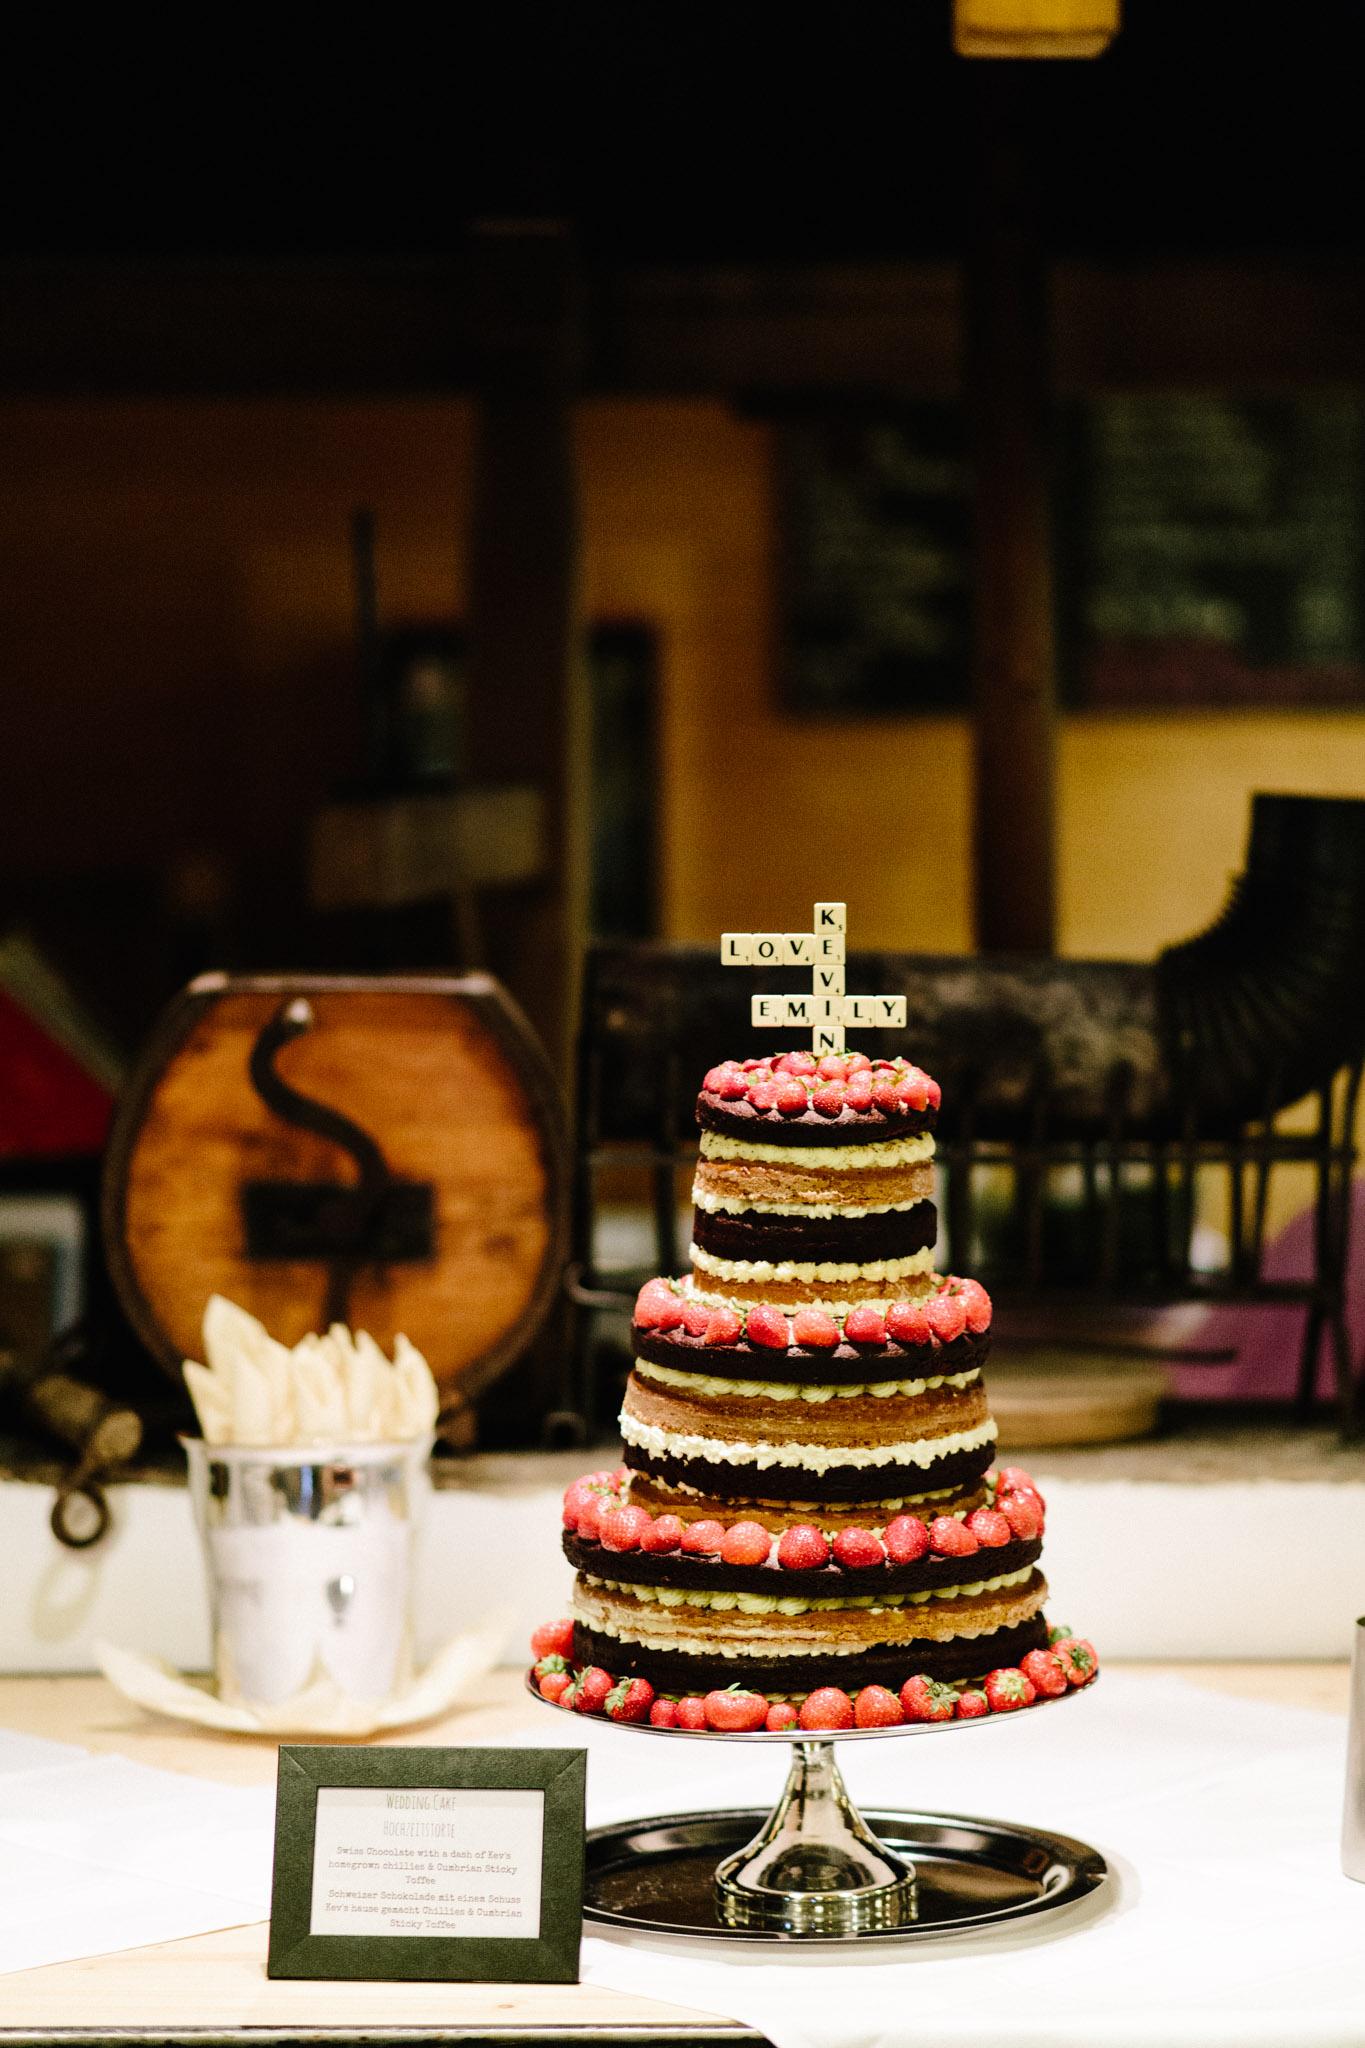 Lenl-Simmental-Buehlerhof-Pia-Anna-Christian-Wedding-Photography-EK-94.jpg